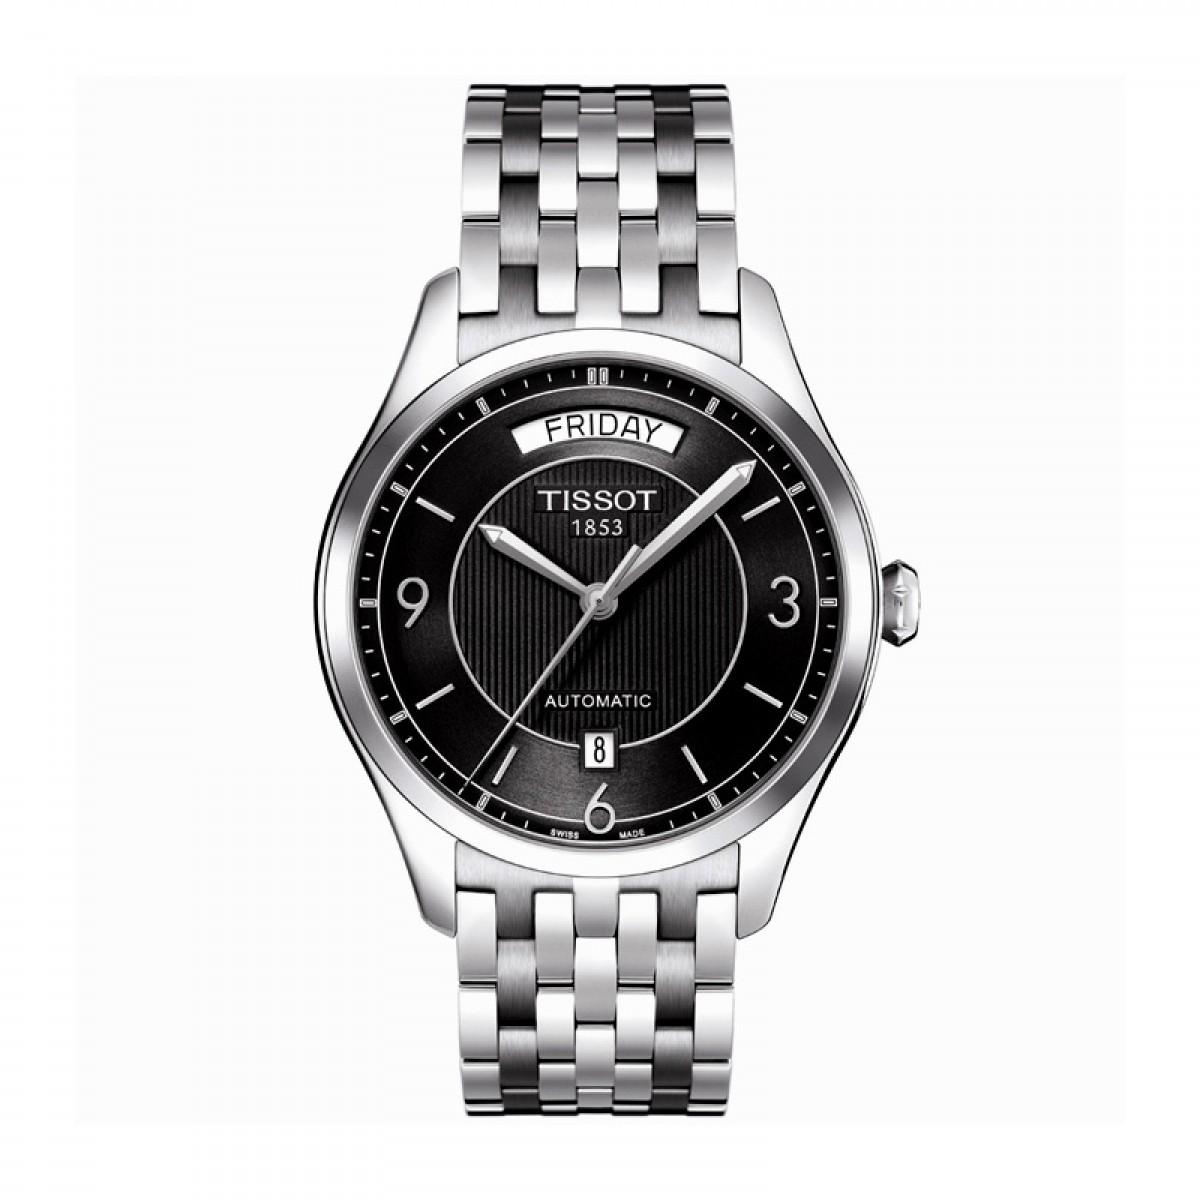 Часовник Tissot T038.430.11.057.00